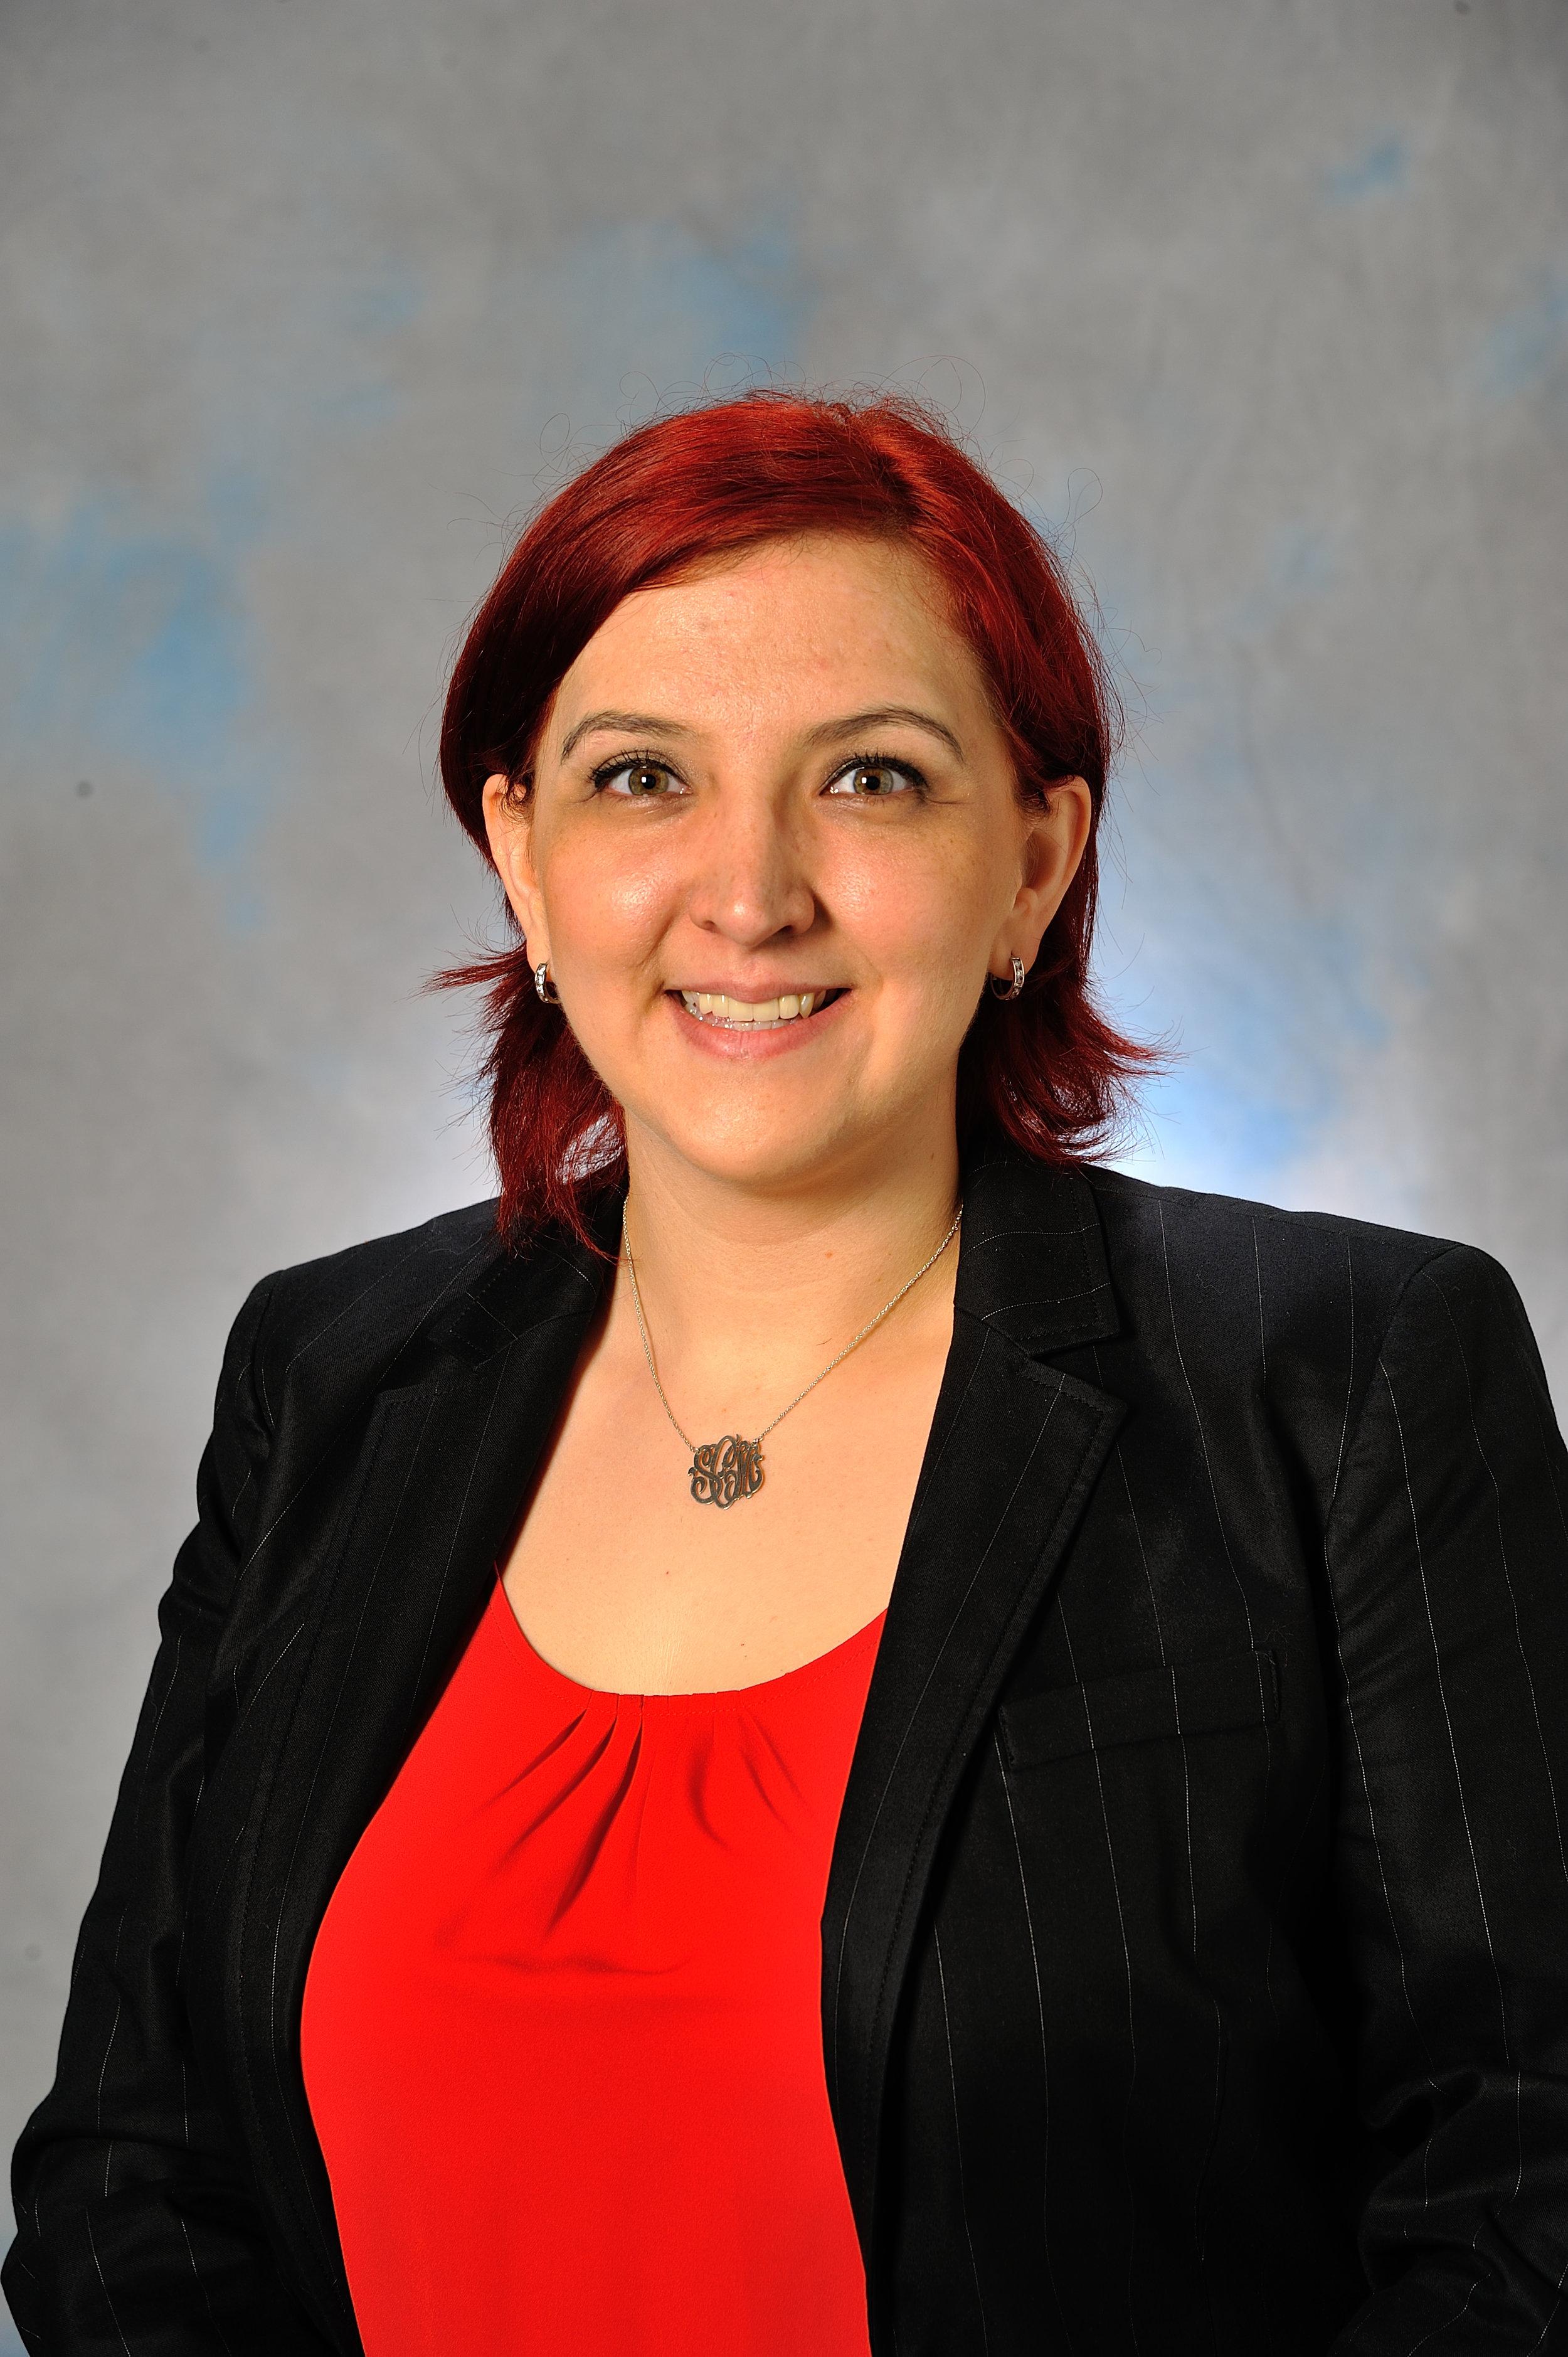 Stephanie Crowley - Albert Schweitzer Fellow for LifeSSHP Clinical Skills Compeition P3/P4 1st Team '17-'18SCCP Vice President of Interdisciplinary Development '17-'18APhA Generation Rx Senior Chair '17-'18; Junior Chair '16-'17HOMES Clinic Sr. Representative '17-'18; Jr. Representative '16-'17UHCOP Teamwork Evaluator Captain '16-'17MAPSA Secretary '16-'17UHCOP c/o 2019 Honor Board Representative '16-'17; '17-'18; '18-'19SSHP Clinical Skills Competition P1/P2 1st Place Team '15-'16 & '16-'17; TSHP P1/P2 Division '15-'16 1st Place Team & 2nd Place Team '16-'17